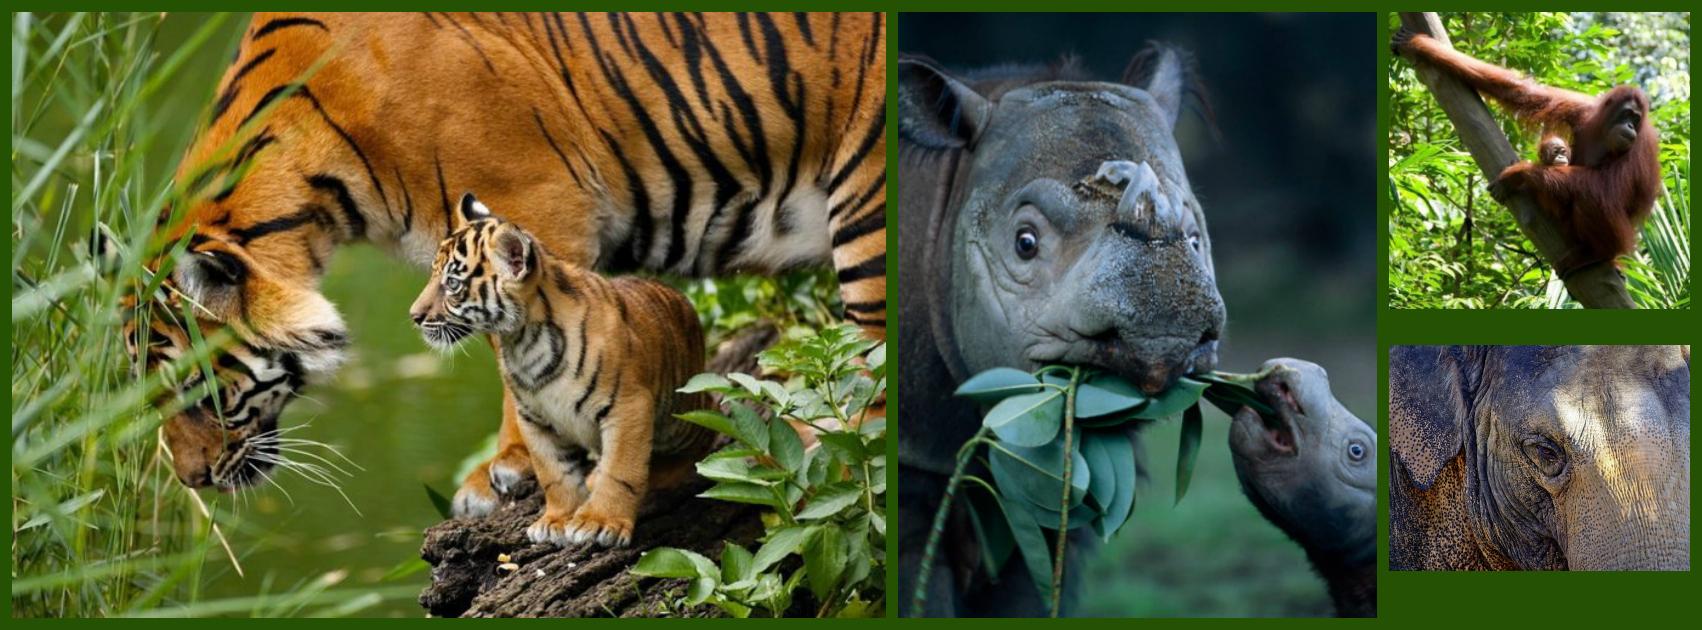 Iconic species of the Leuser Ecosystem of Sumatra, Indonesia